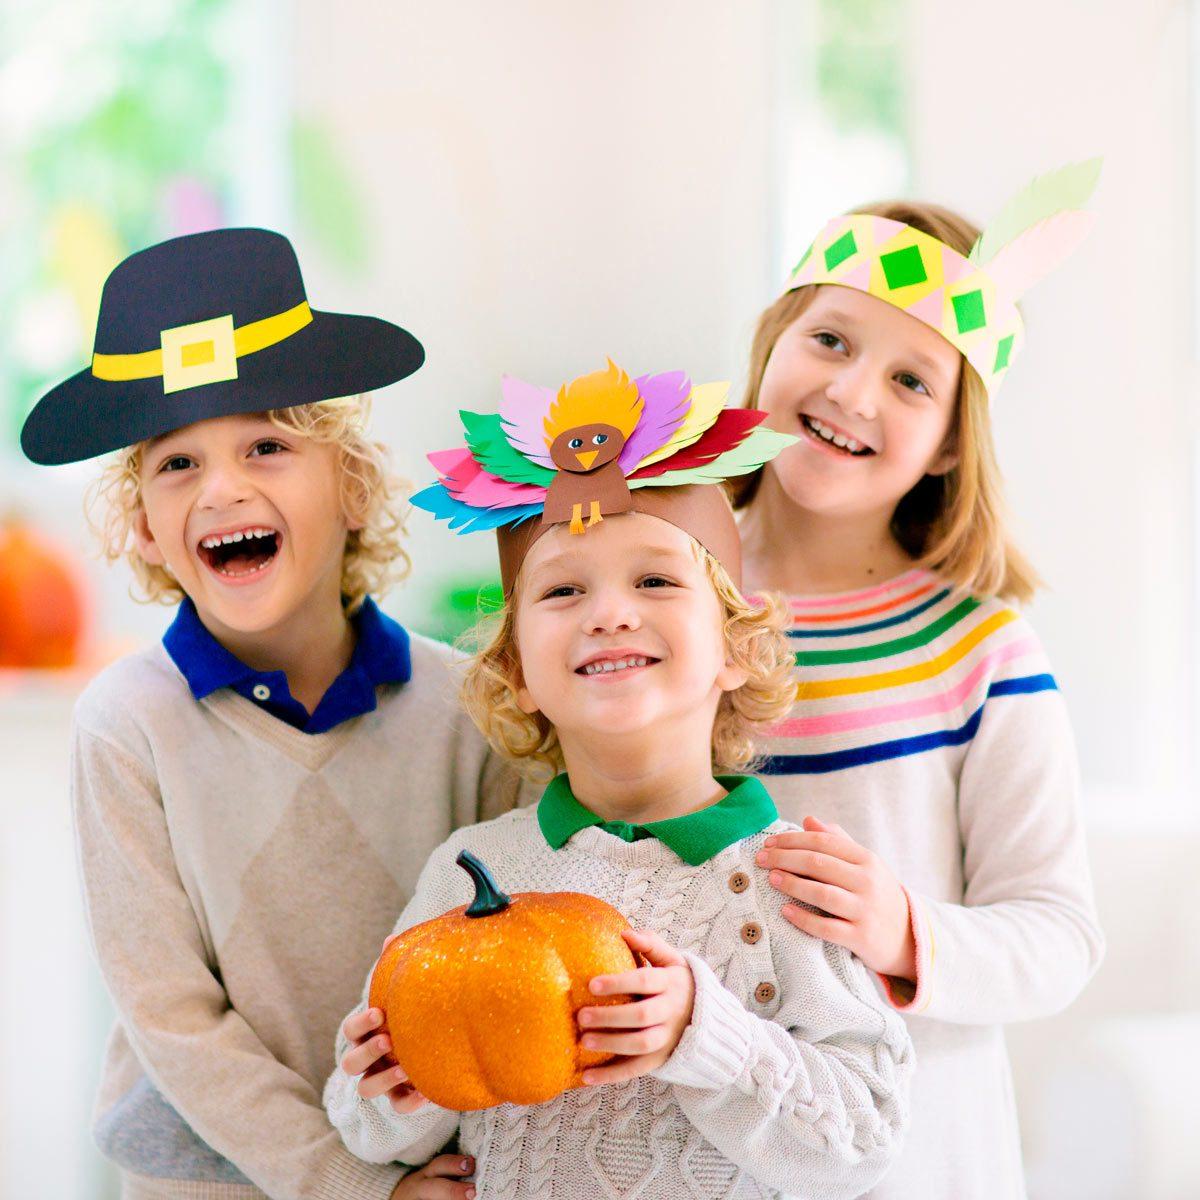 10 Ideas for Entertaining Kids on Thanksgiving